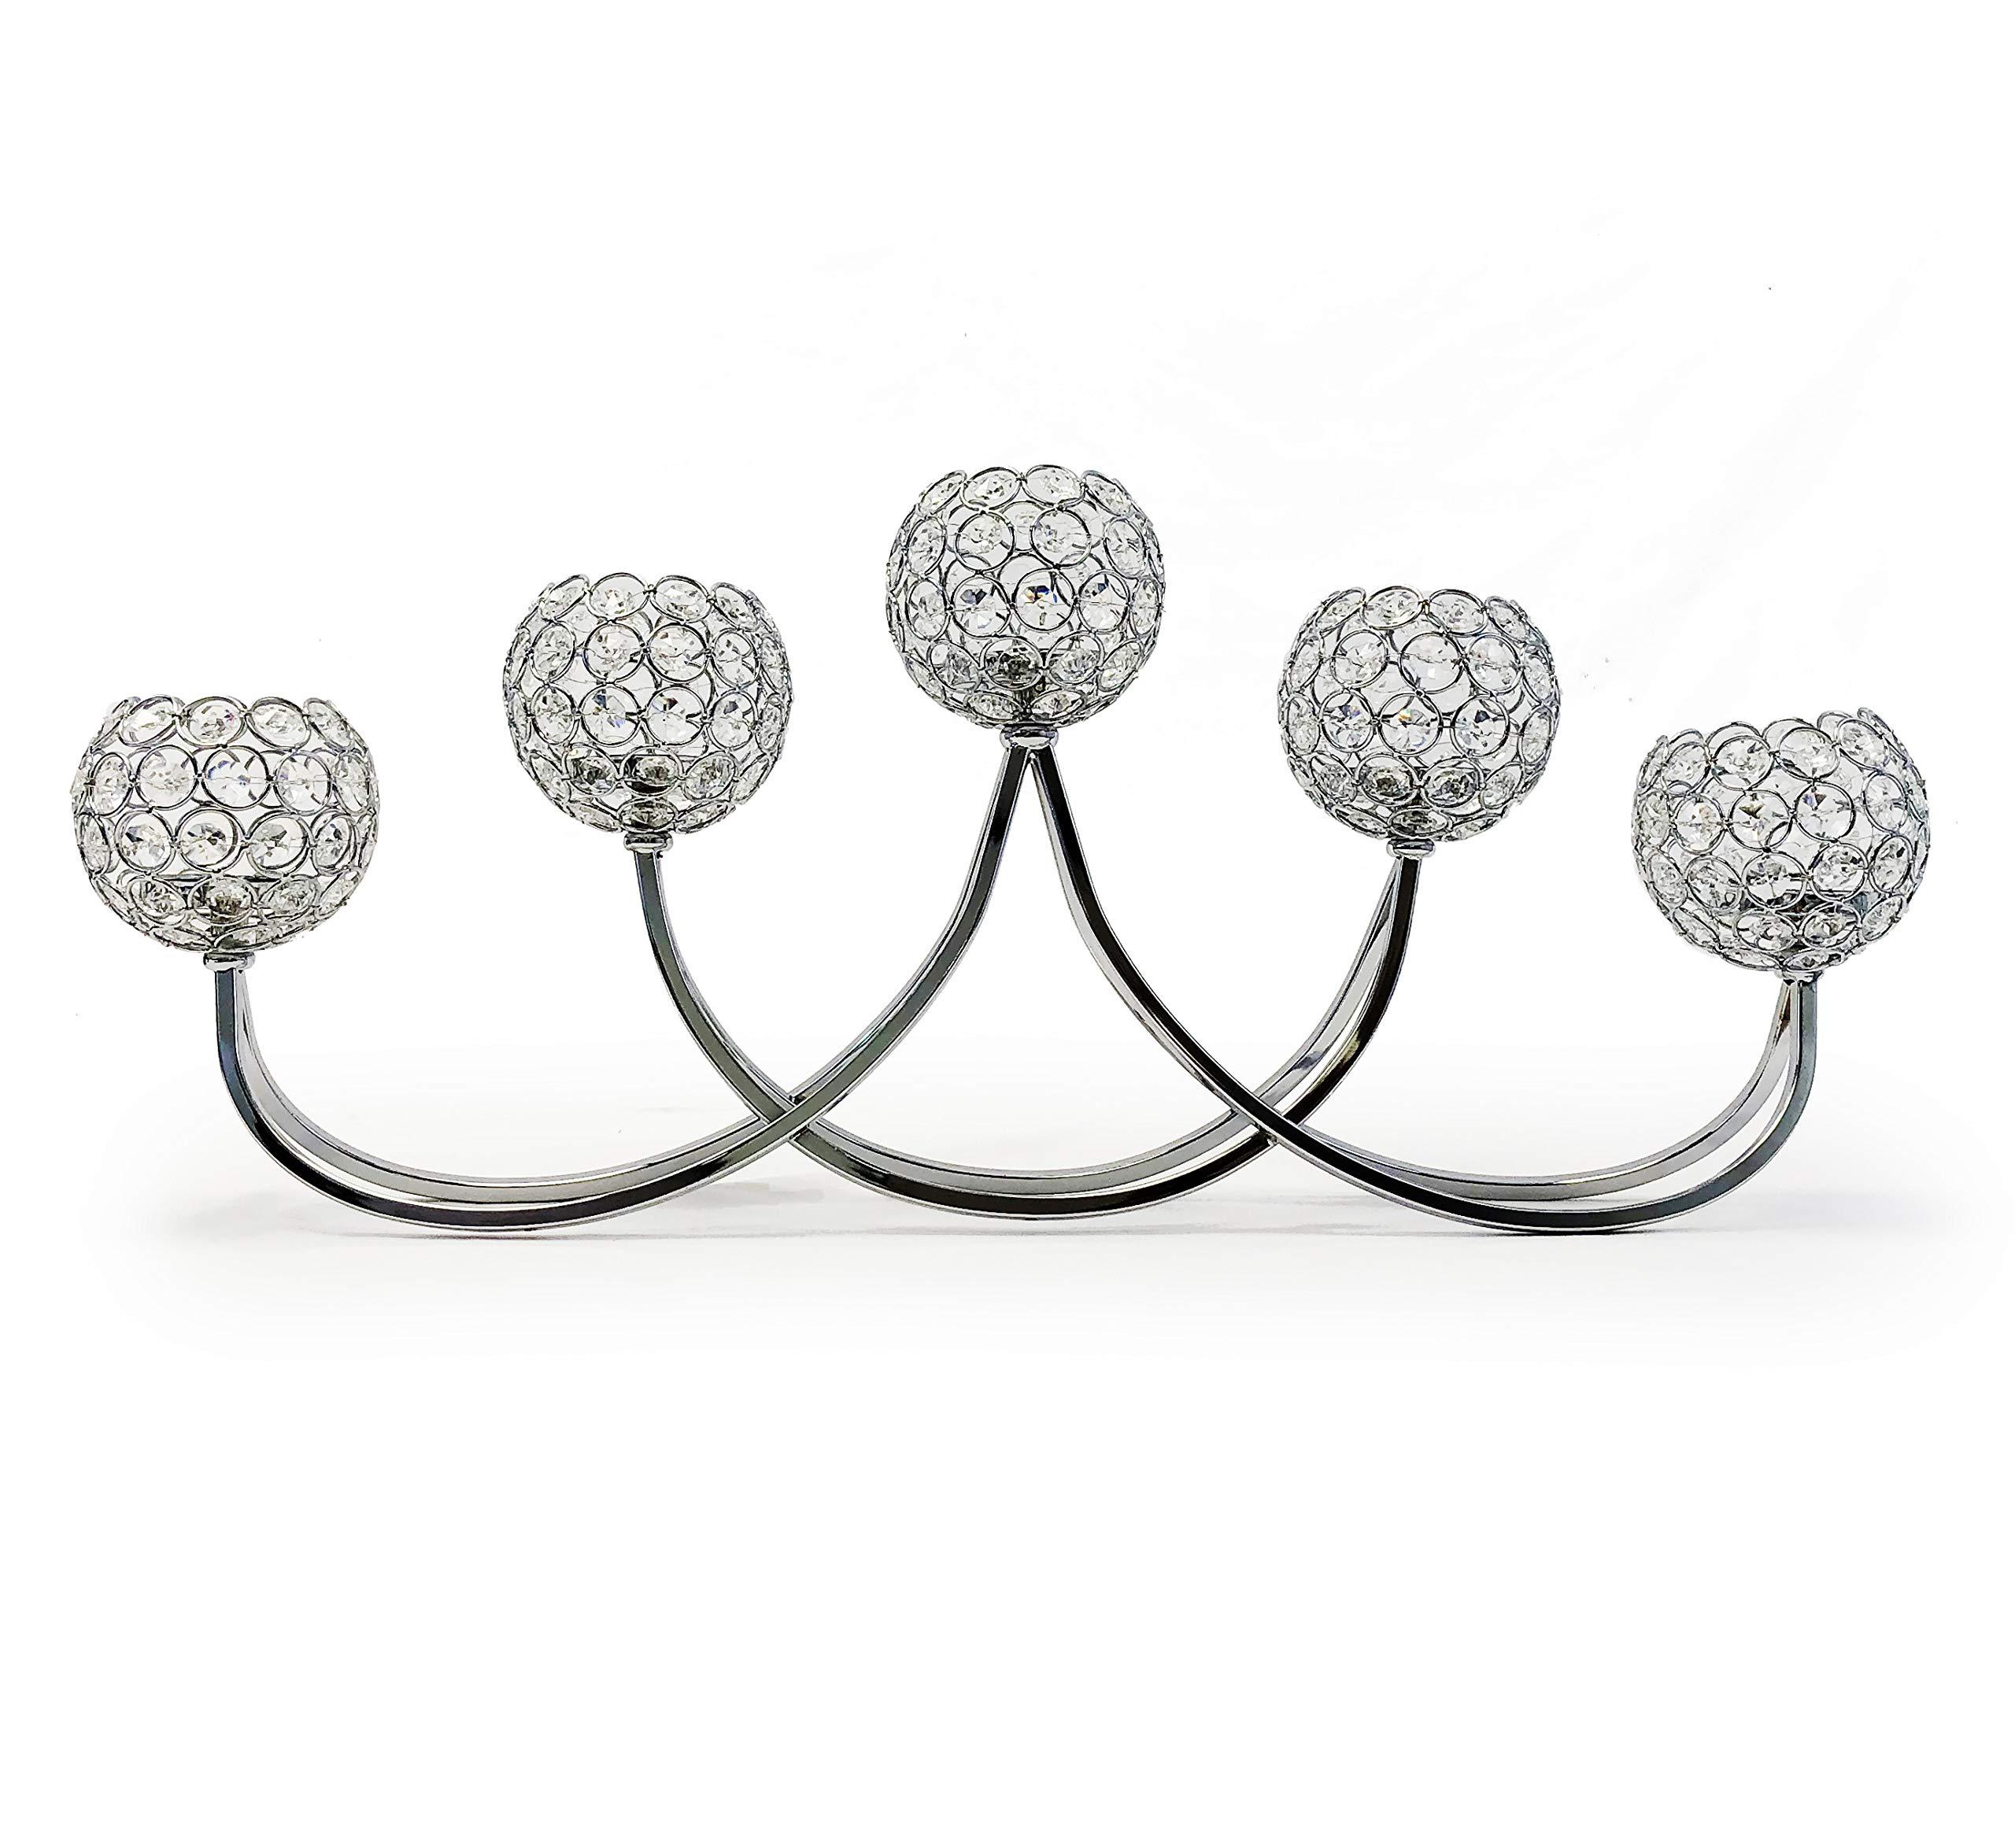 allgala 27'' 5 Bowl Crystal Silver Plated Tealight Votive Decorative Candle Holder Candelabra